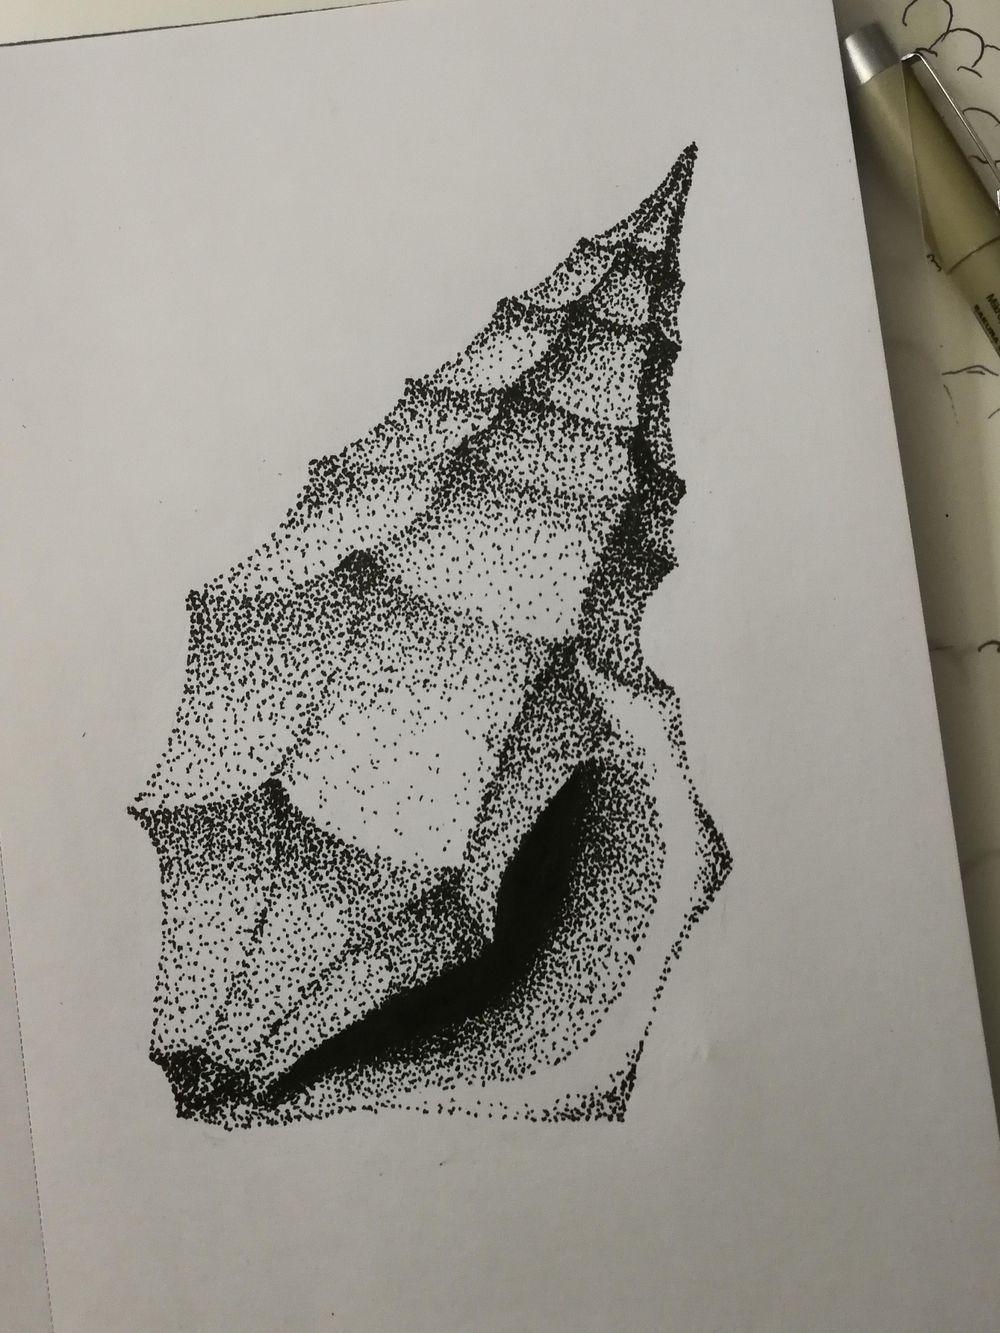 Seashell - image 3 - student project